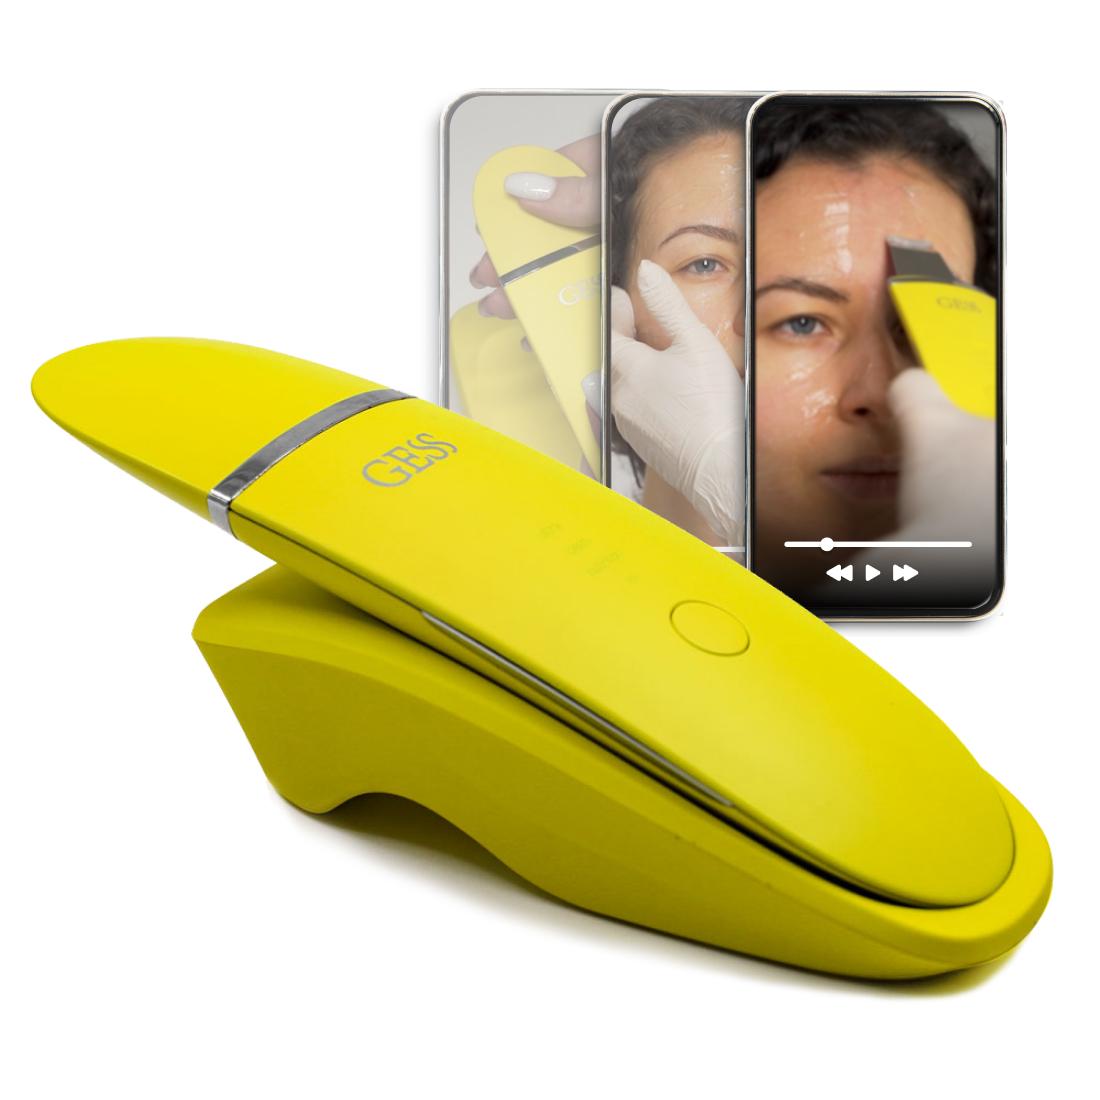 Ultrasonic Facial Cleansing